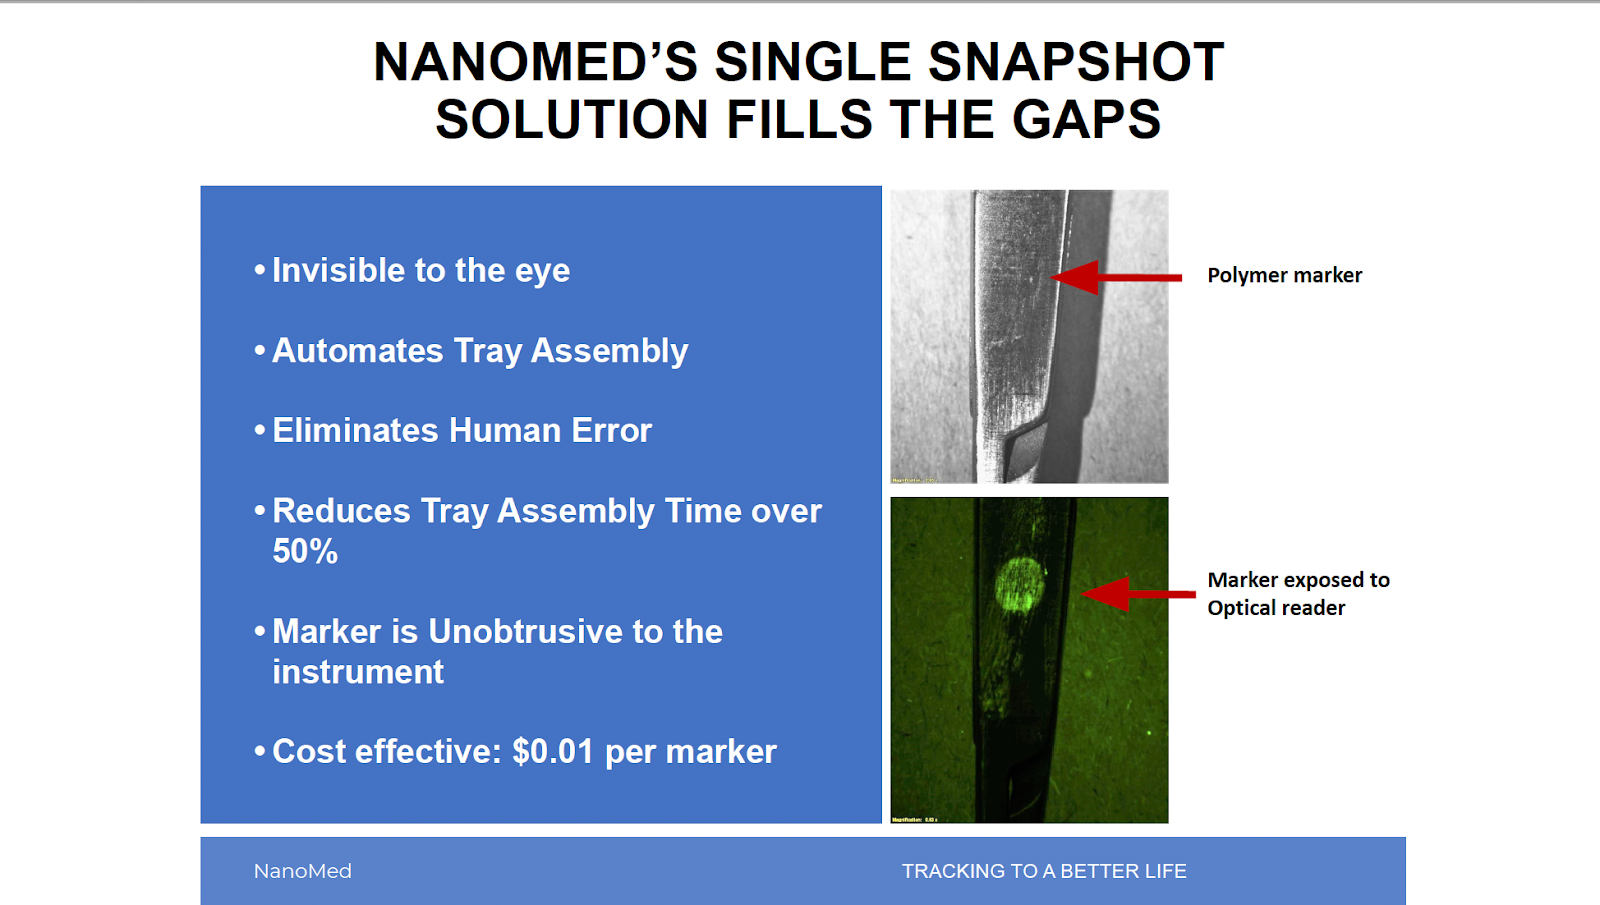 single-snapshot-solution